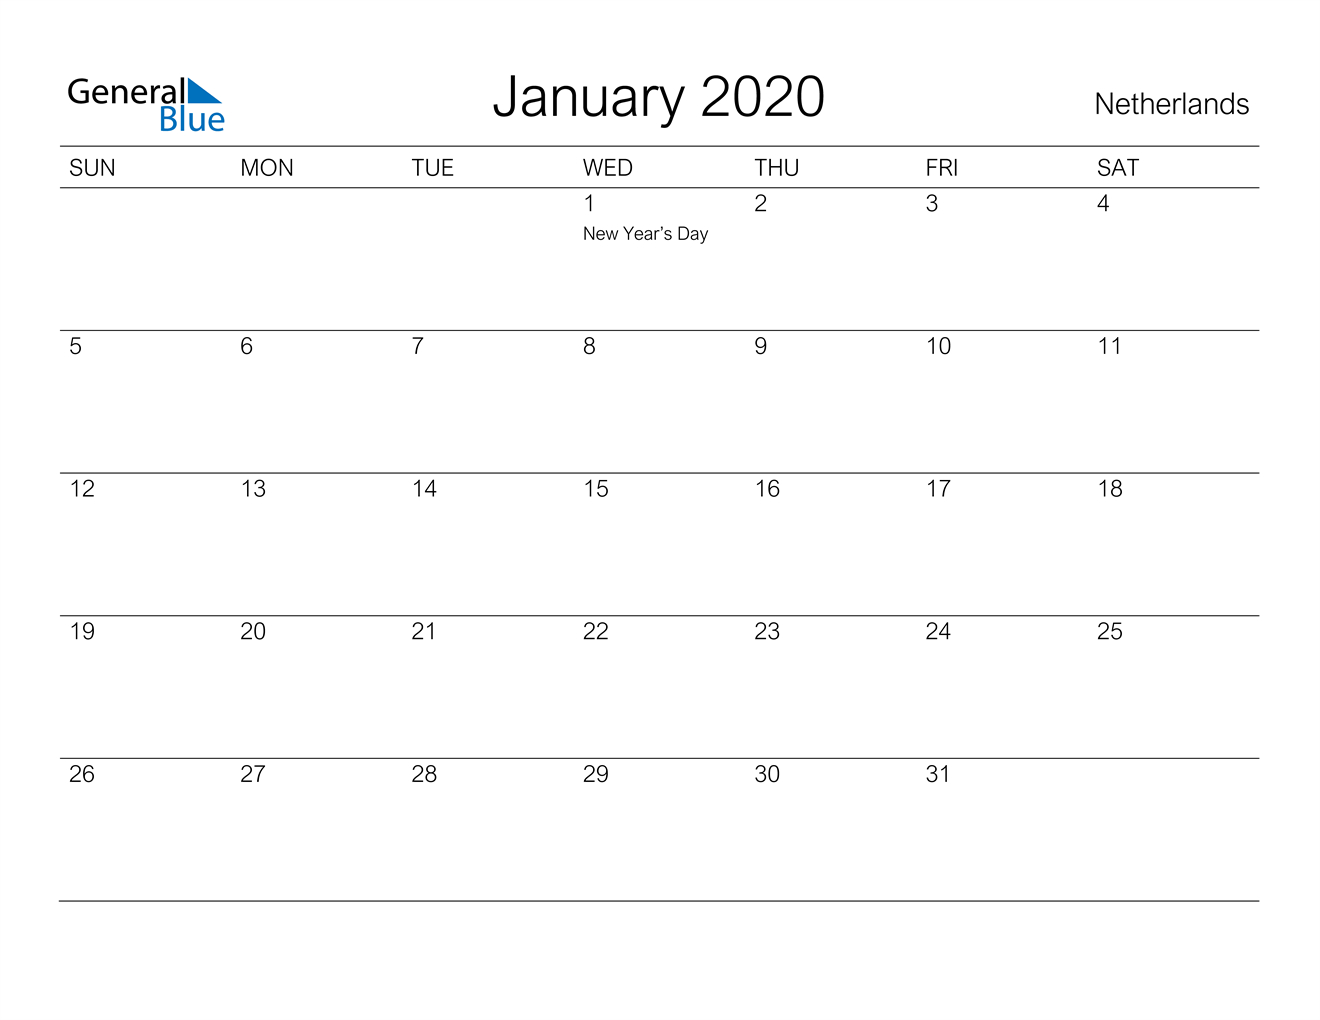 January 2020 Calendar - Netherlands